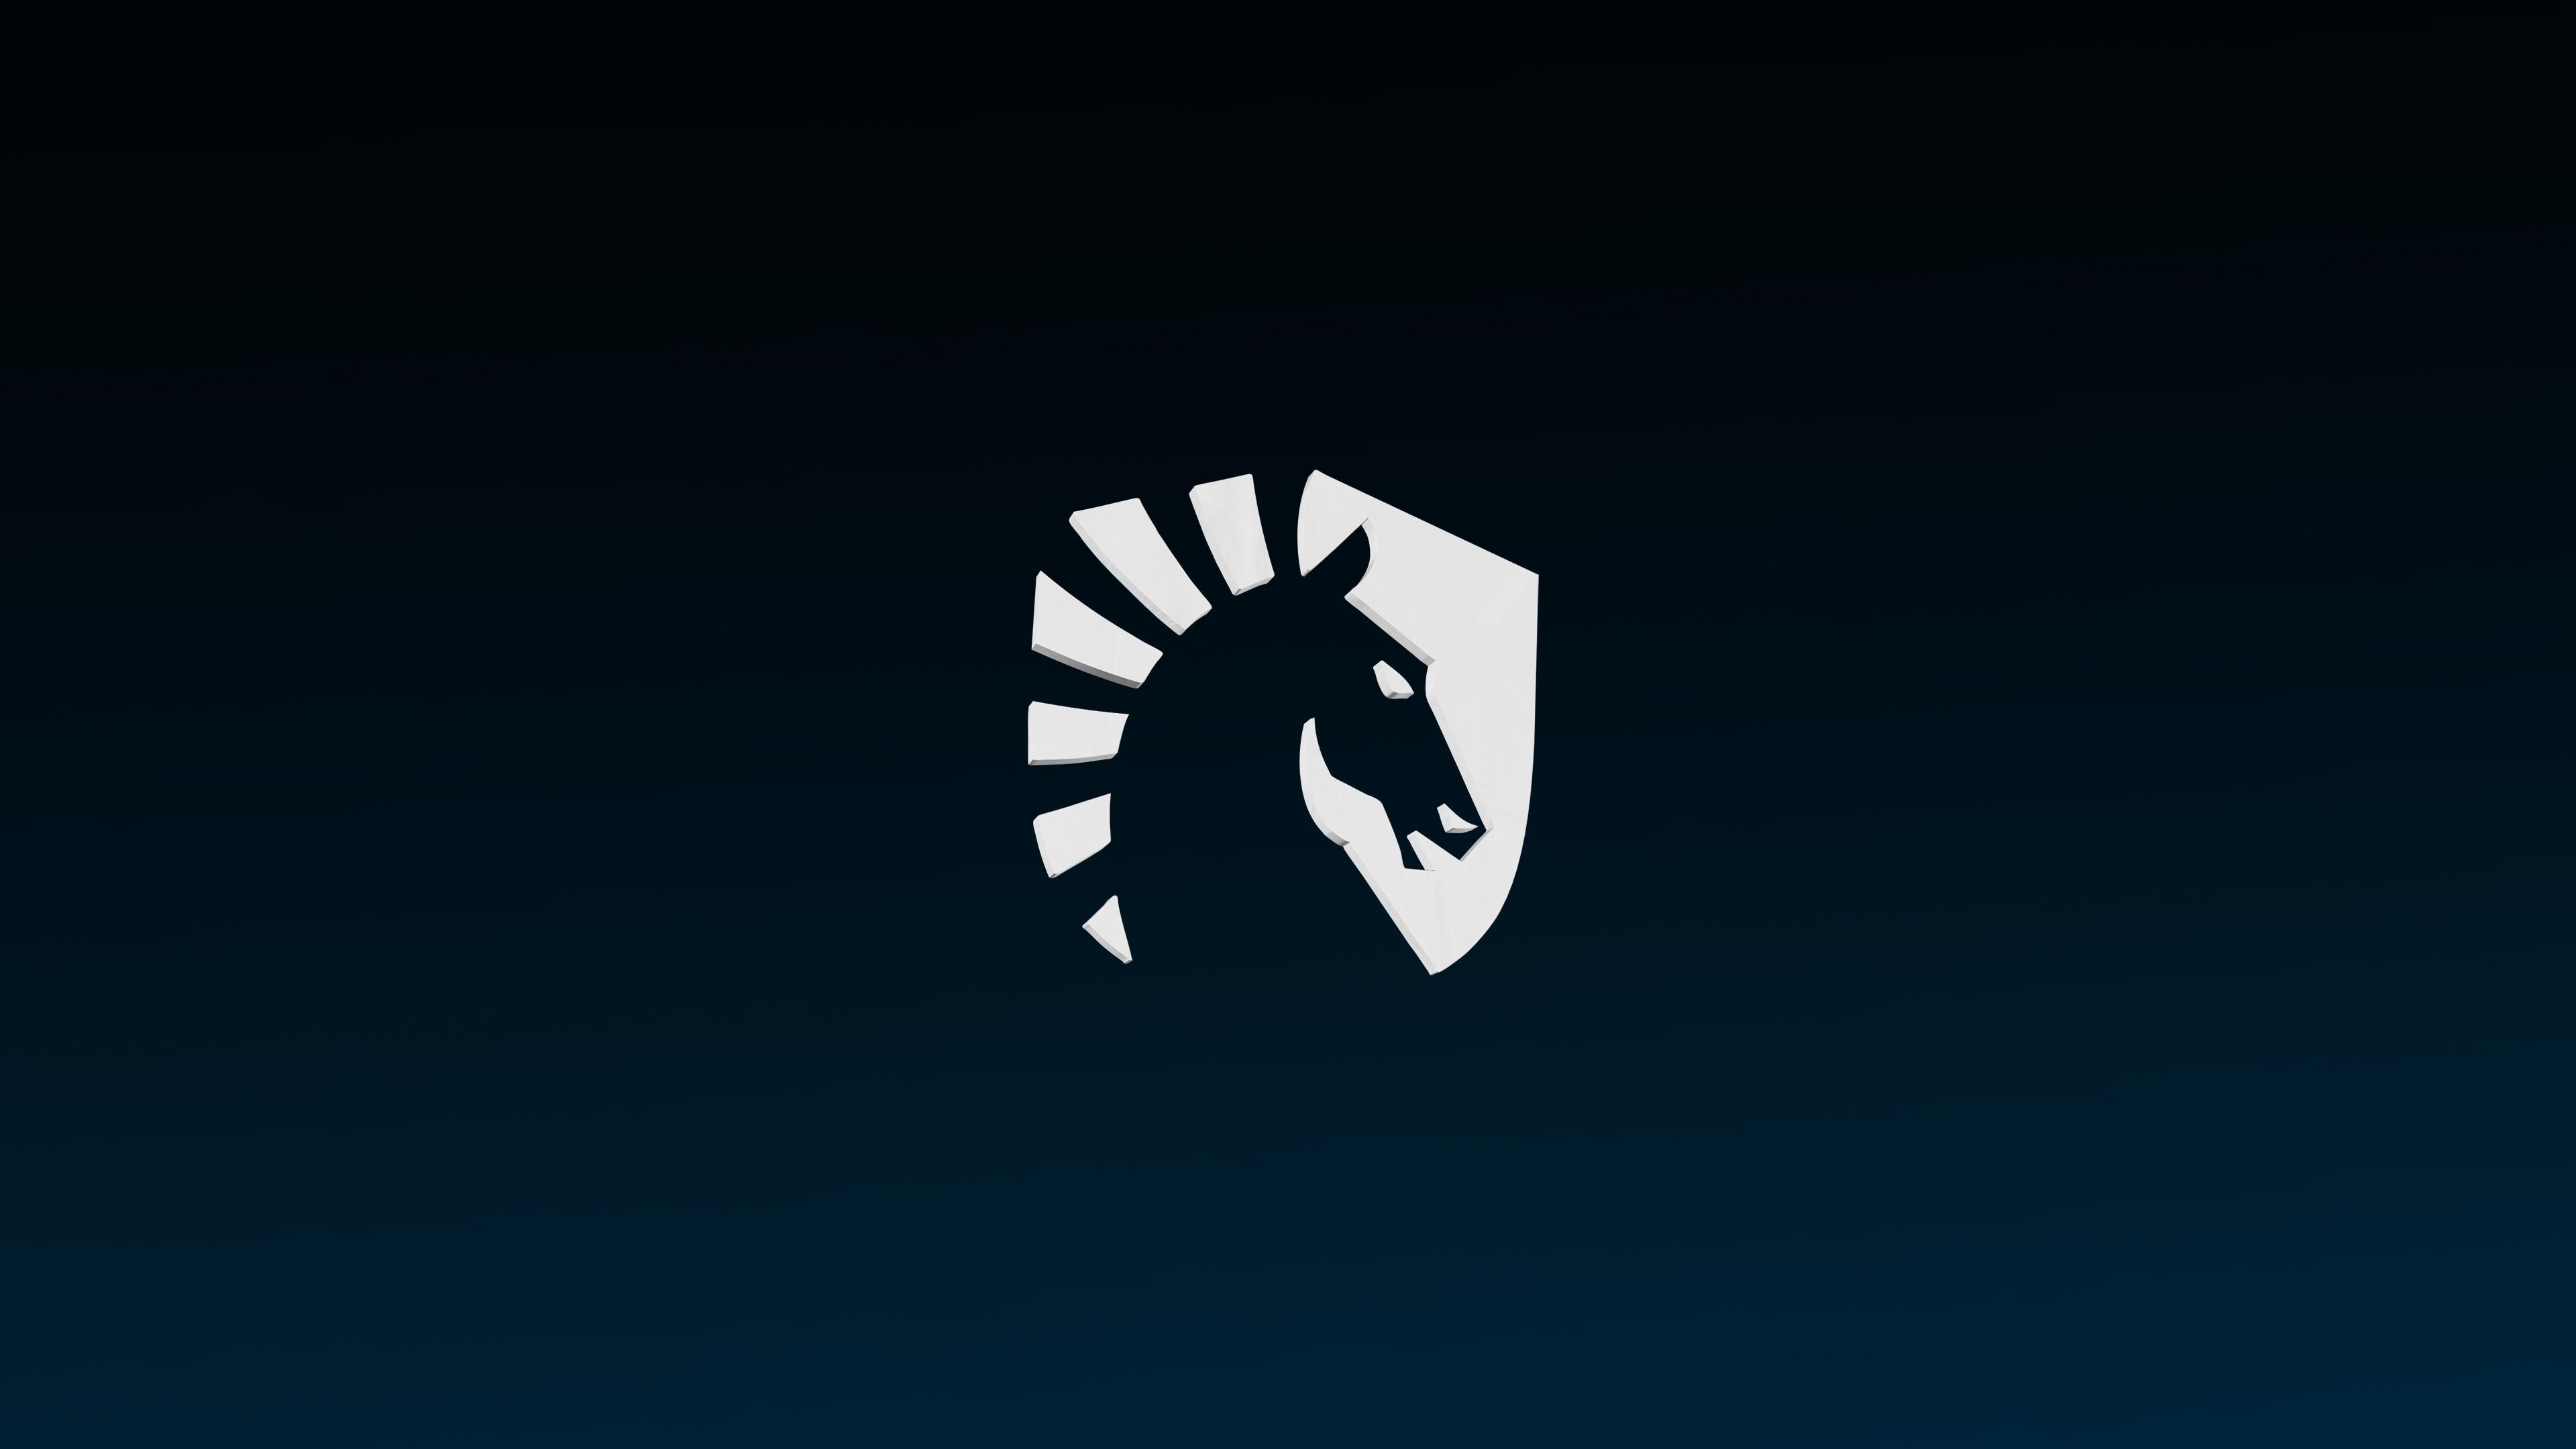 Free Images Team Font Computer Wallpaper Logo Graphics